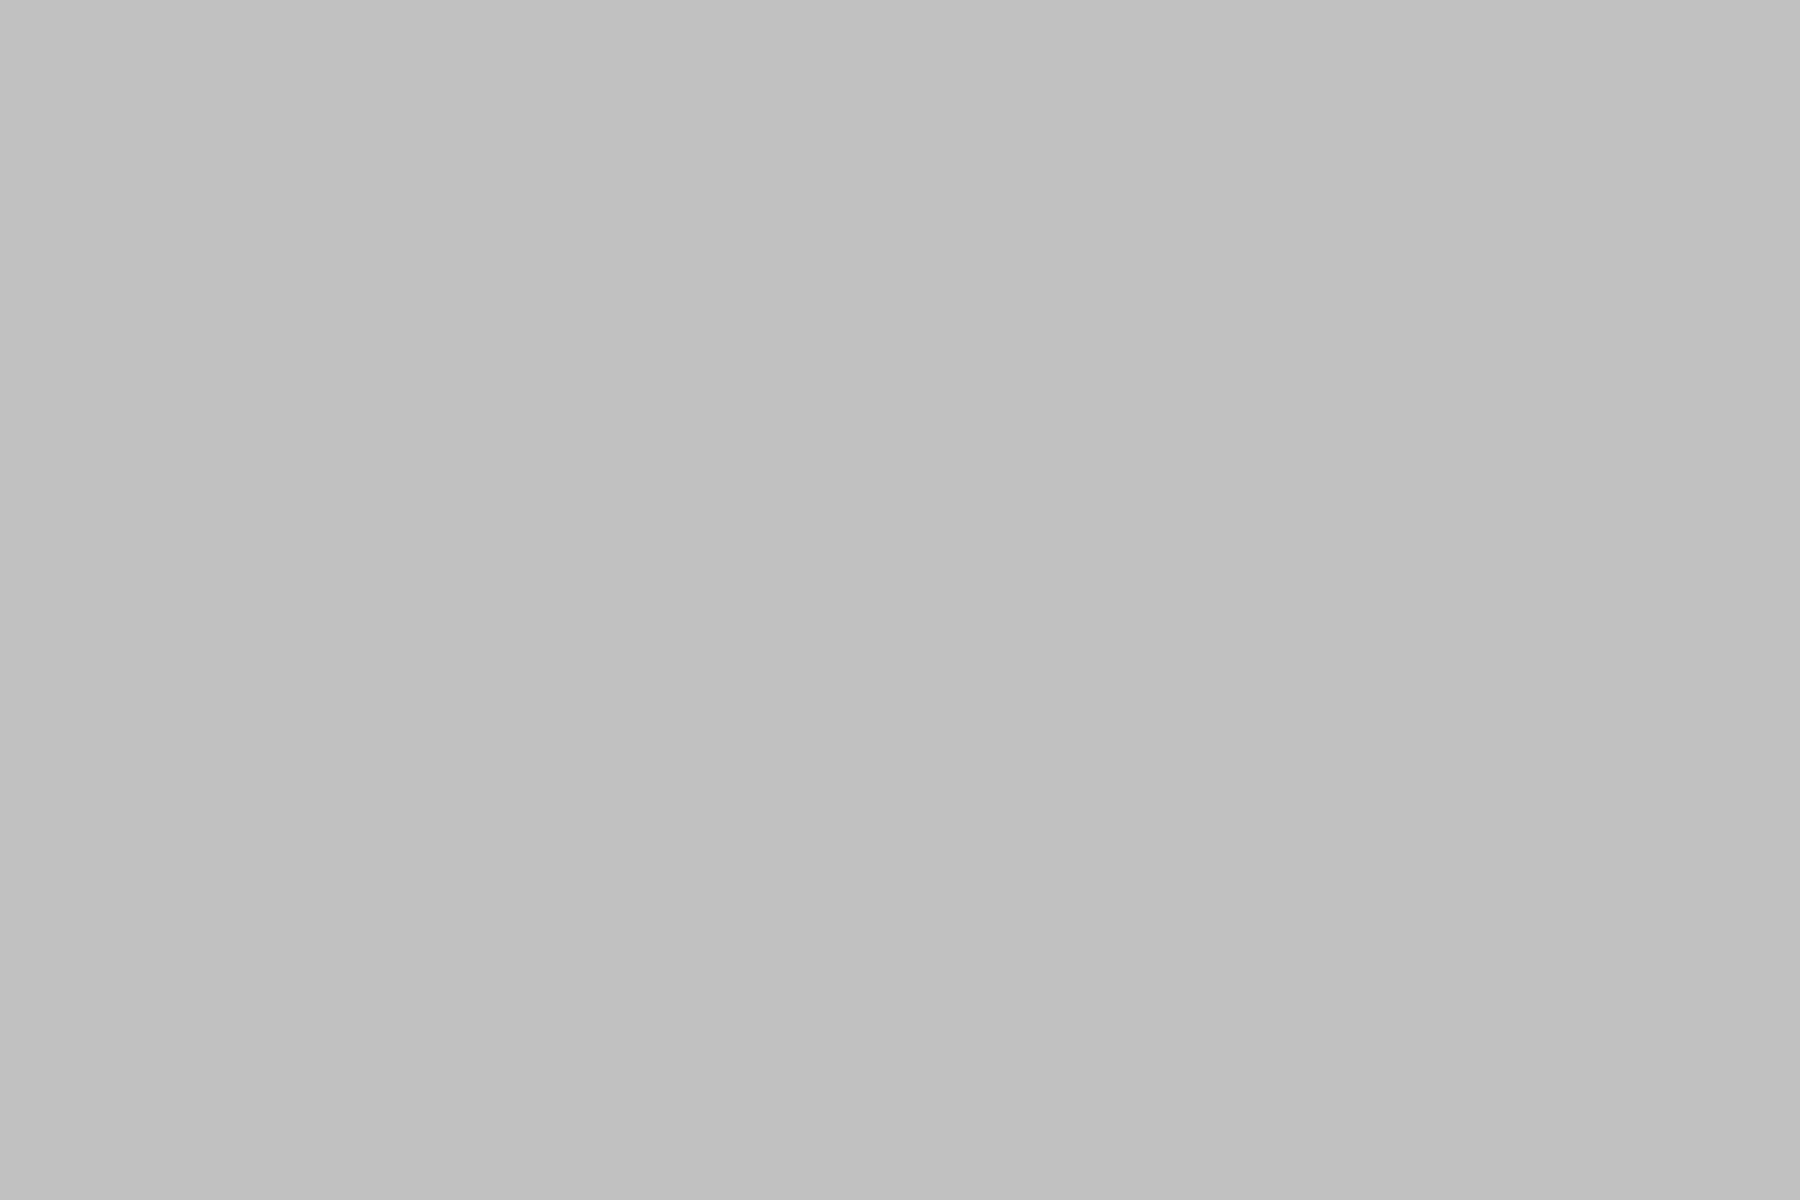 W1187 Dove Grey Ash - 22 x 0.8 mm, 22 x 2 mm